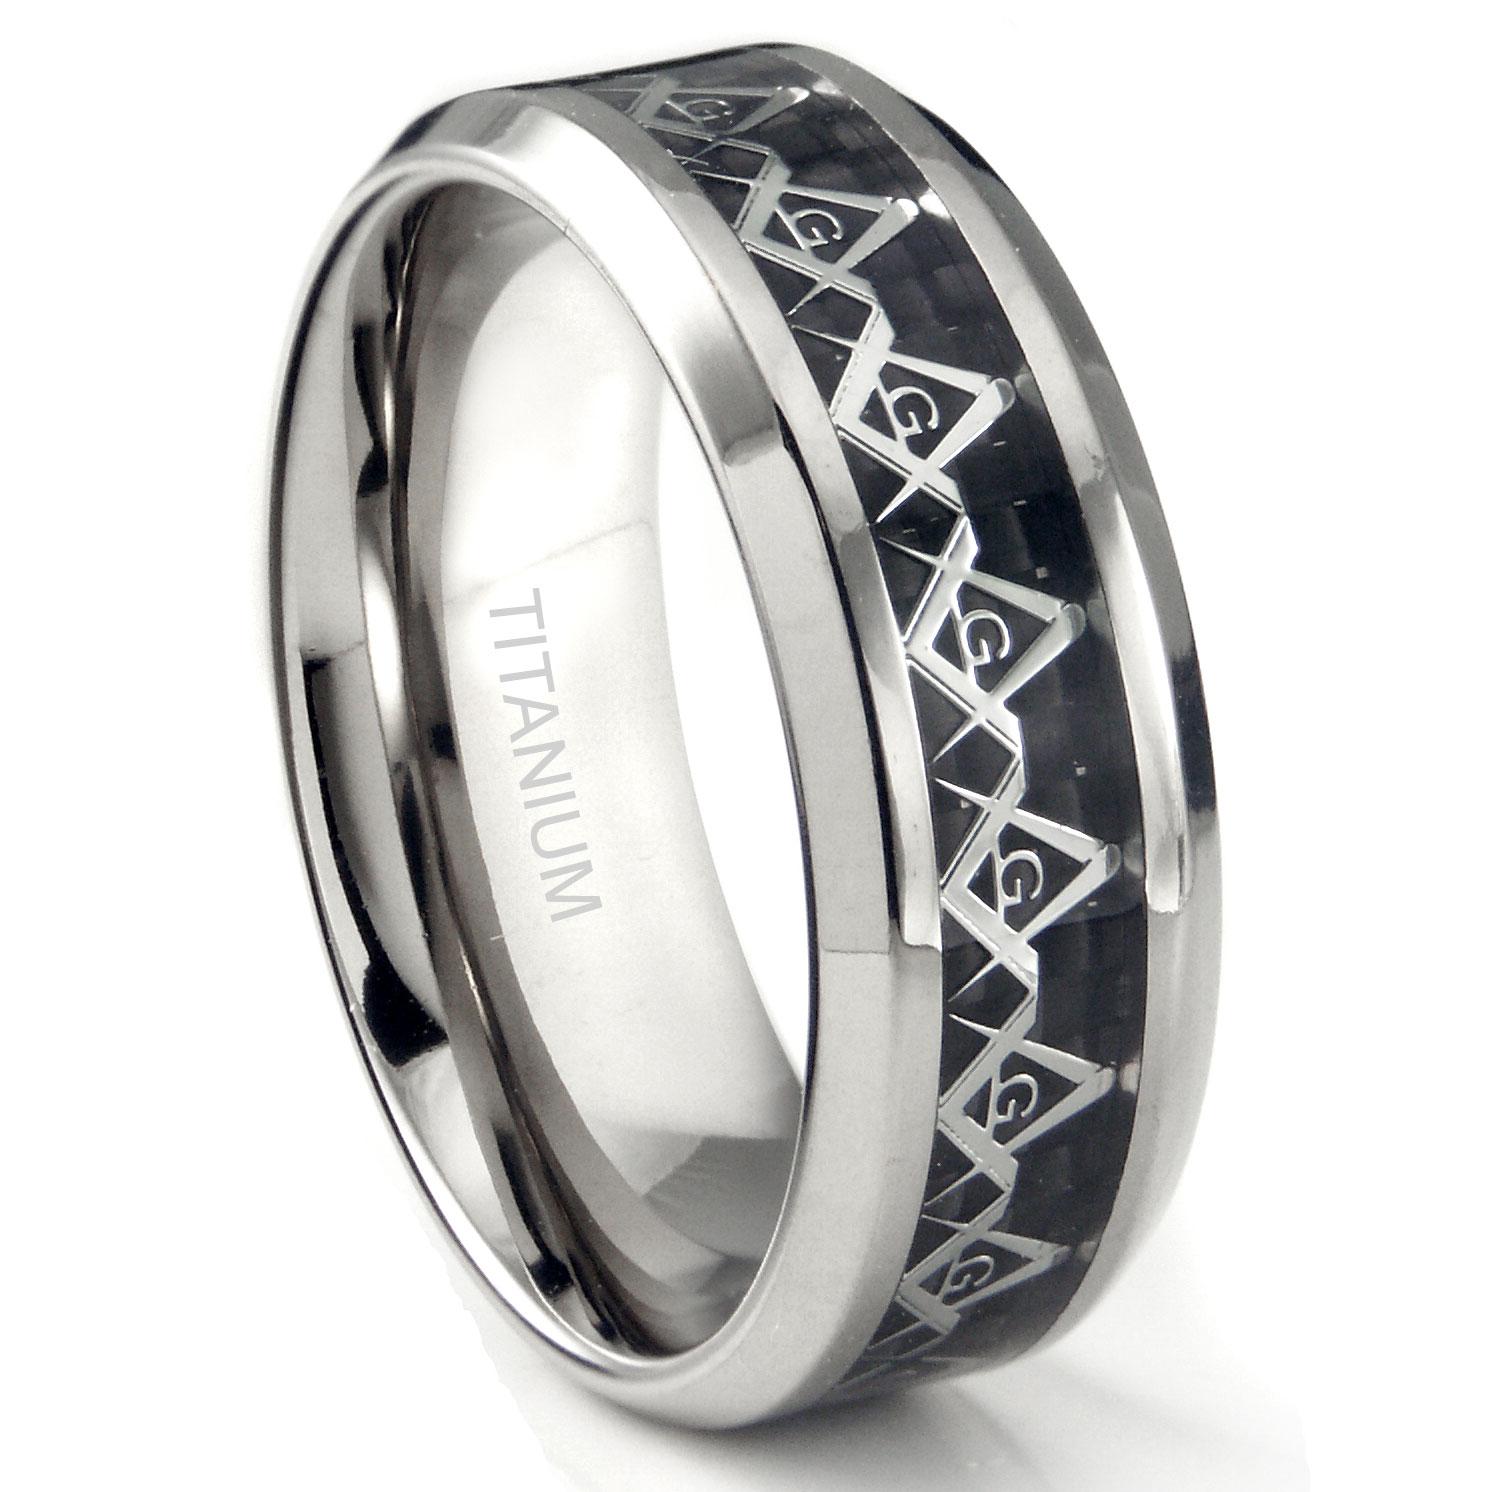 Titanium 8MM Masonic Symbol Inlay over Black Carbon Fiber Inlay Wedding Band Ring P titanium wedding band Home Men s Titanium Wedding Rings Loading zoom